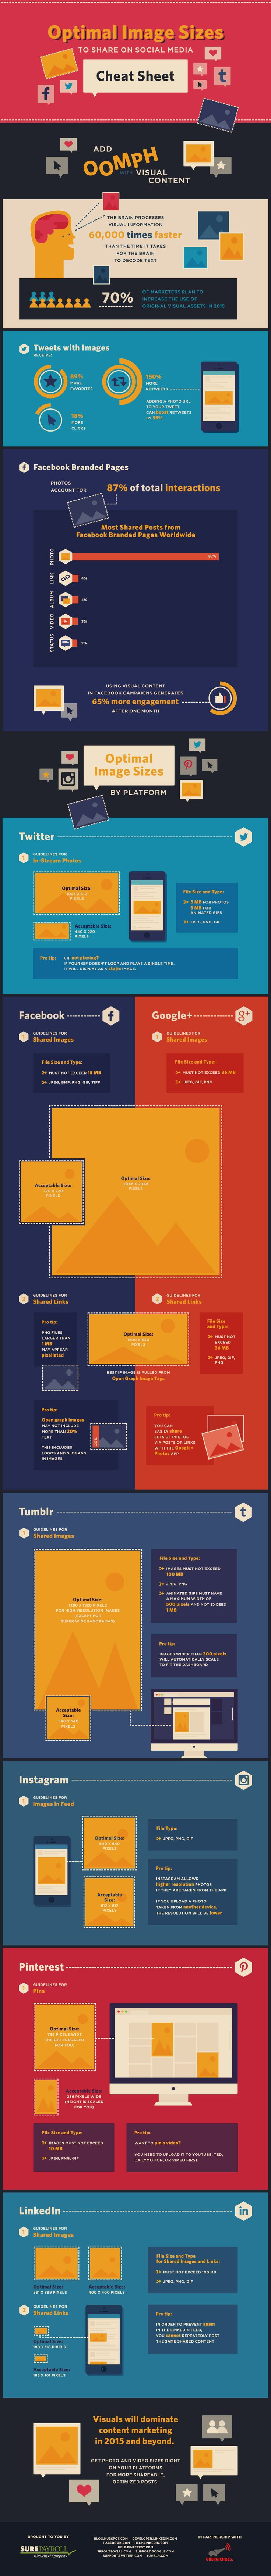 2015 #SocialMedia Image Size Cheat Sheet and Image Tricks